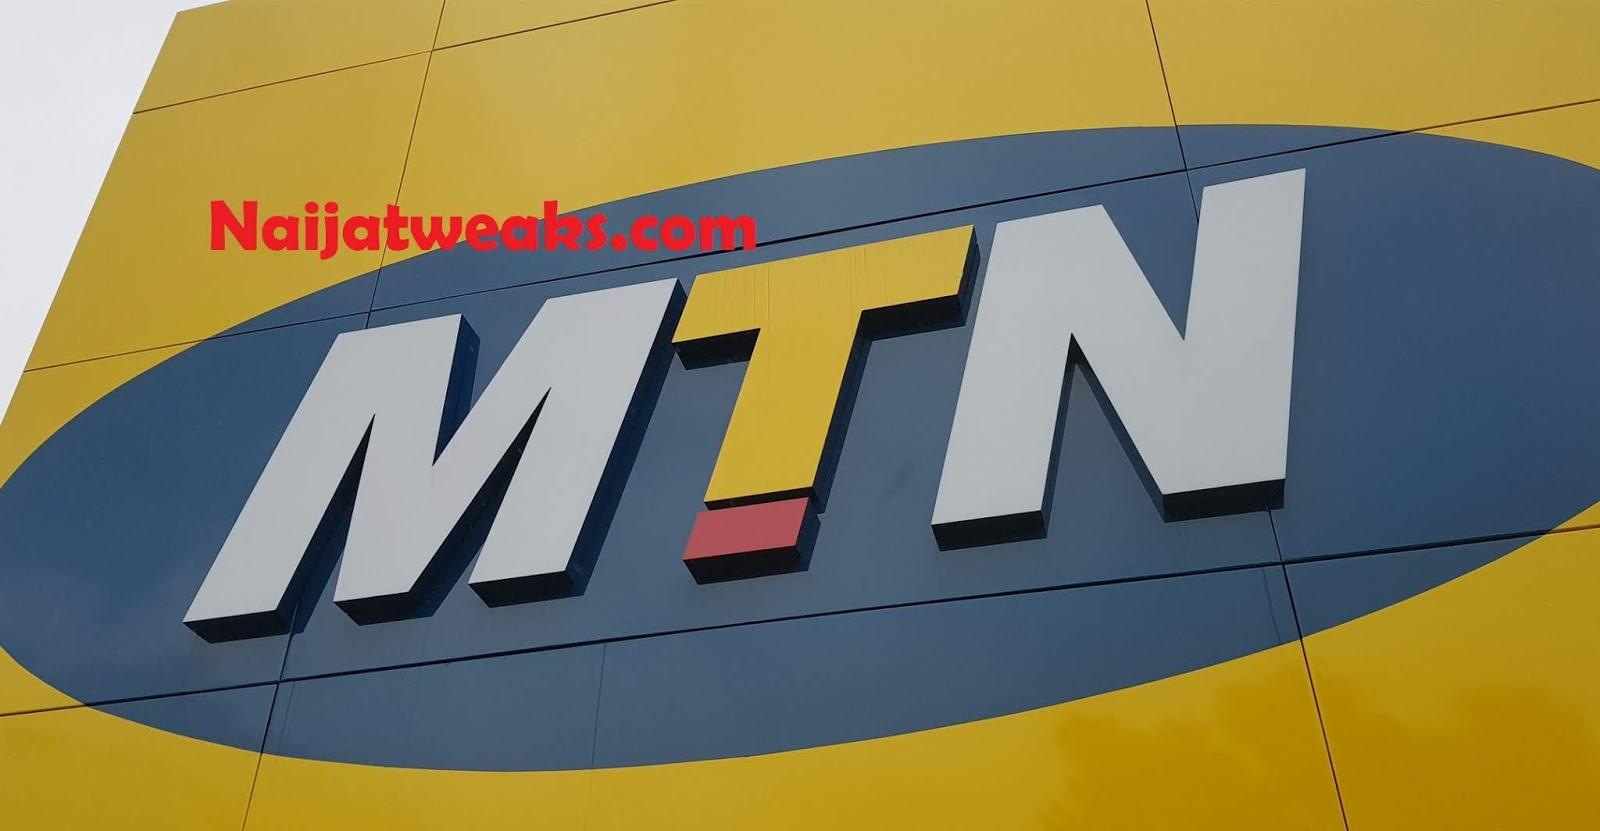 Naijatweaks: Latest on network